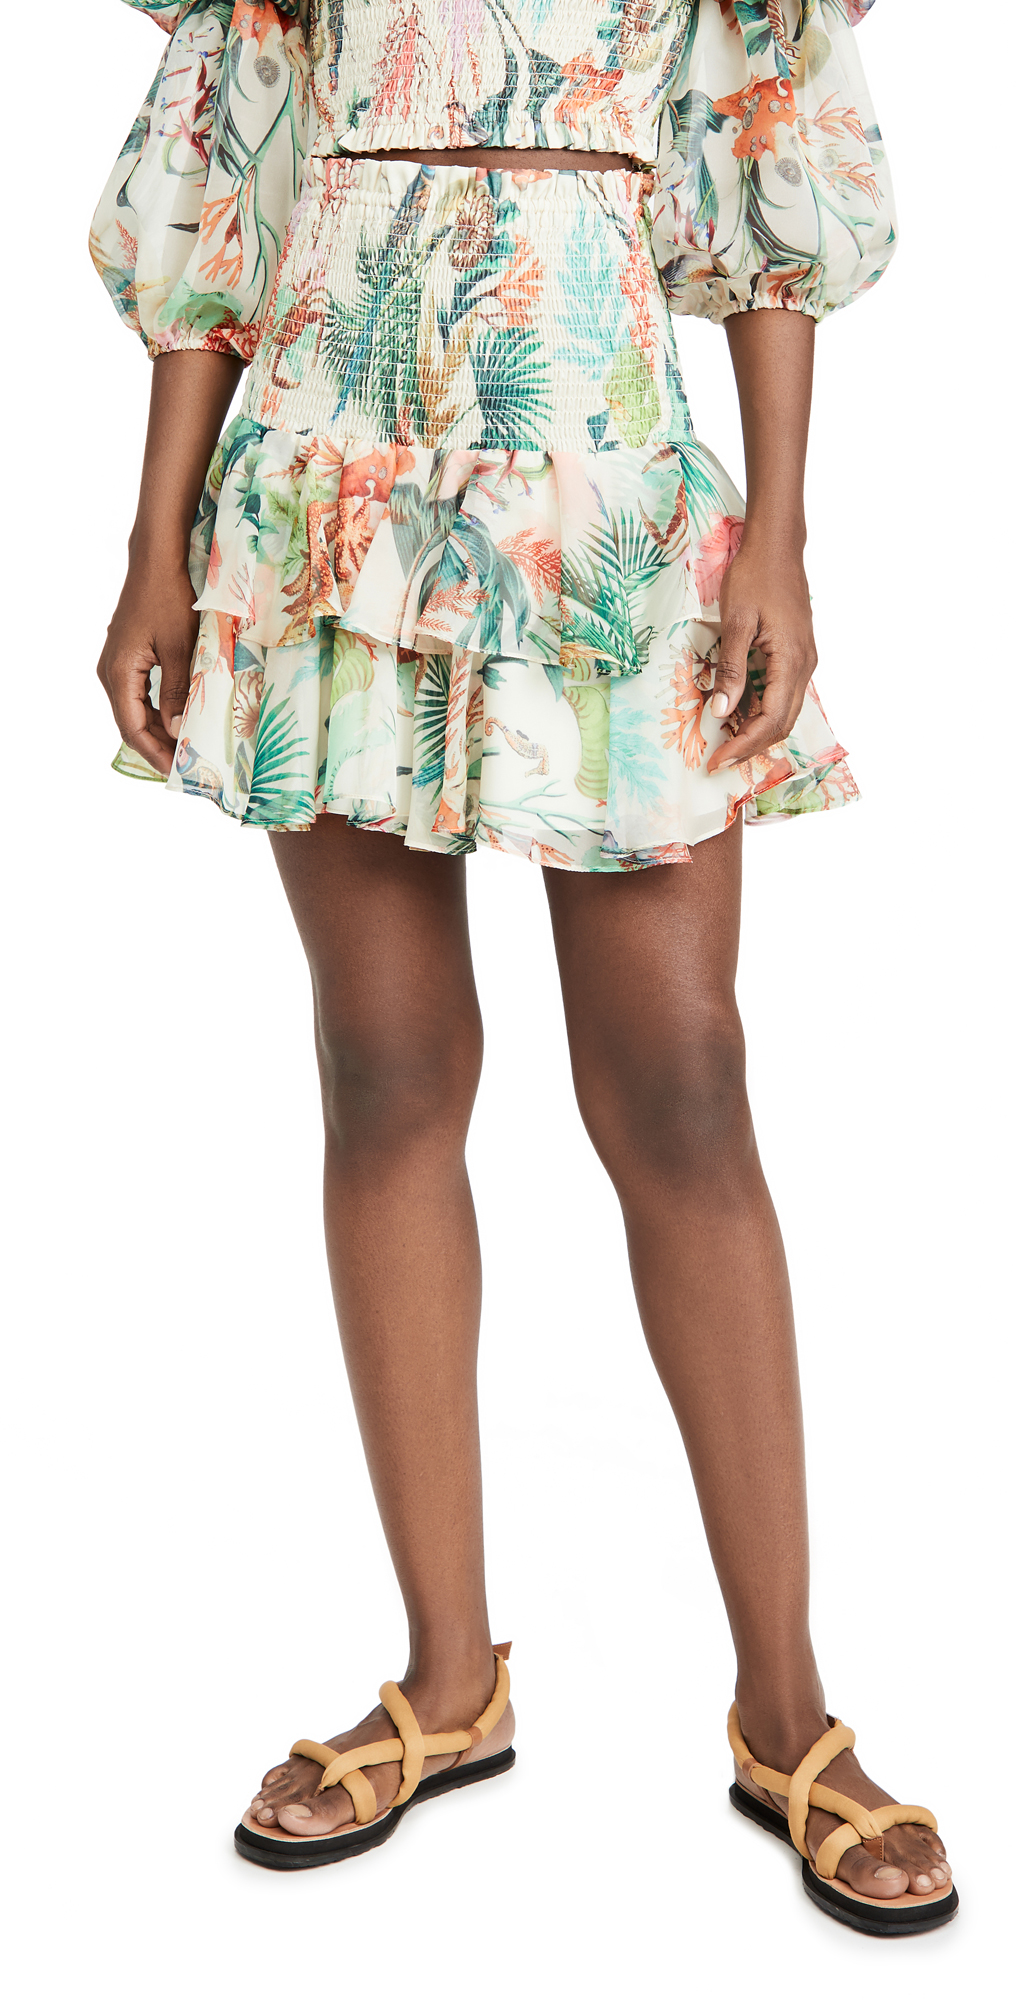 PatBO Oasis Shirred Miniskirt